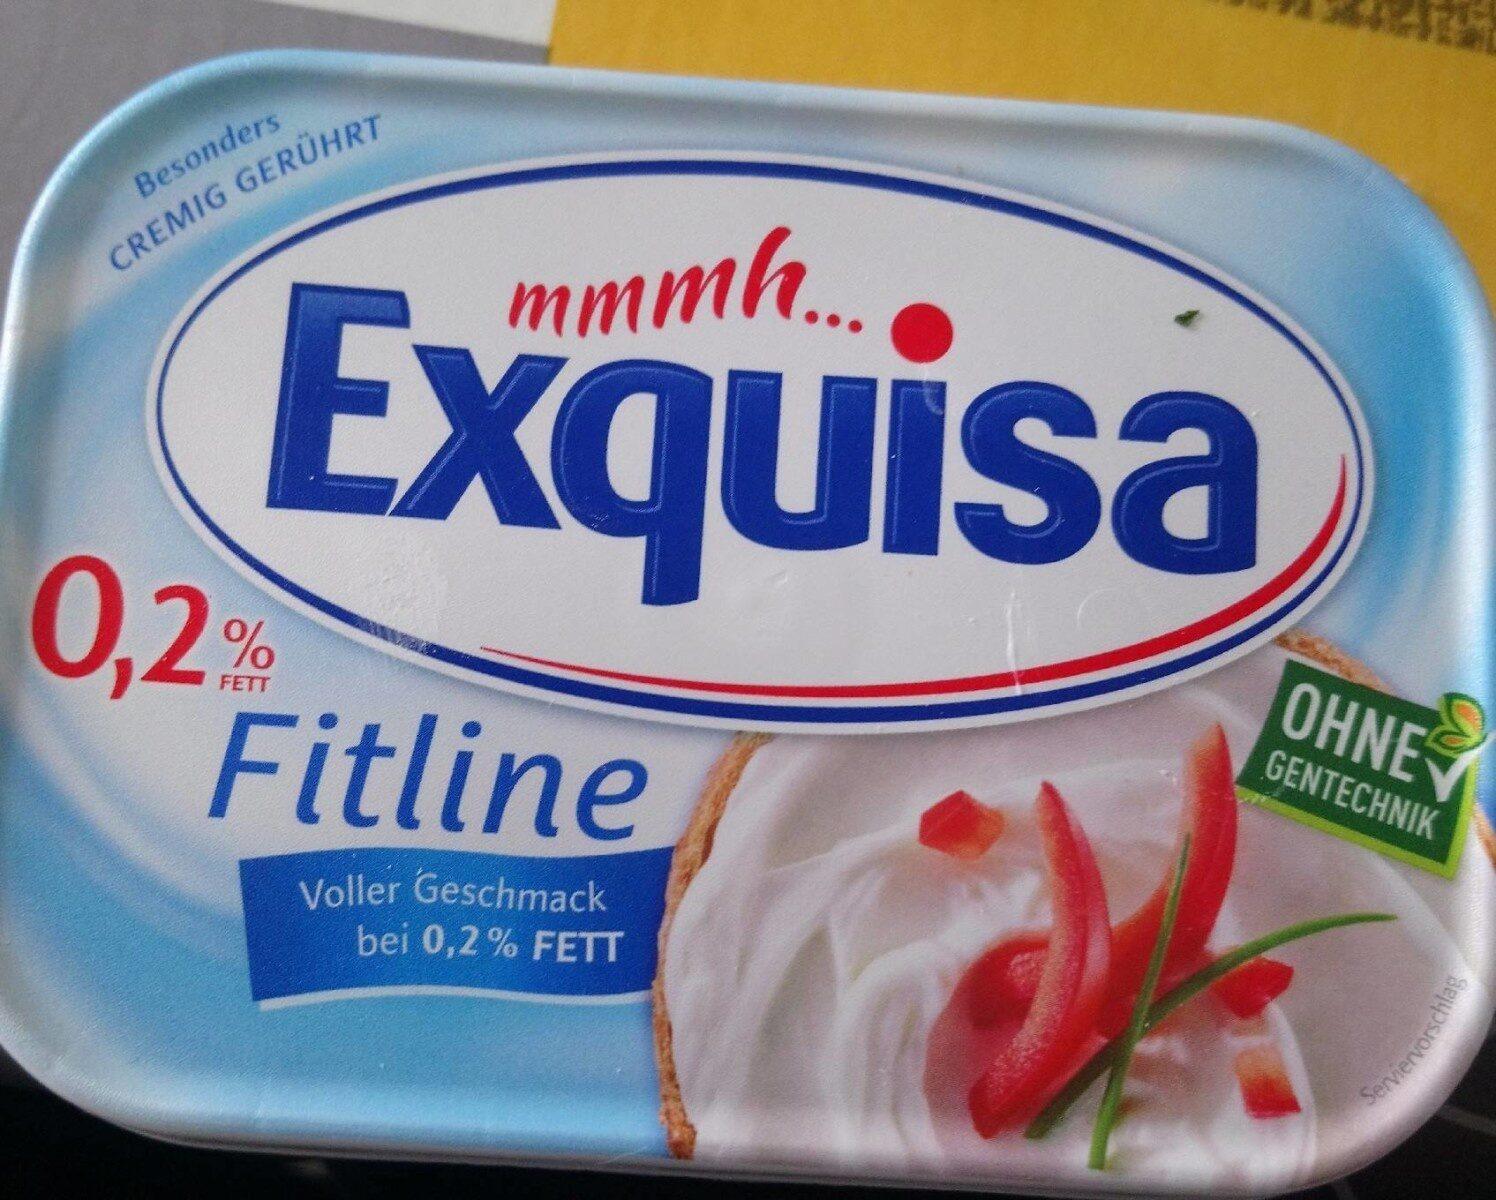 Exquisa Fitline 0,2 Fett% - Produkt - de